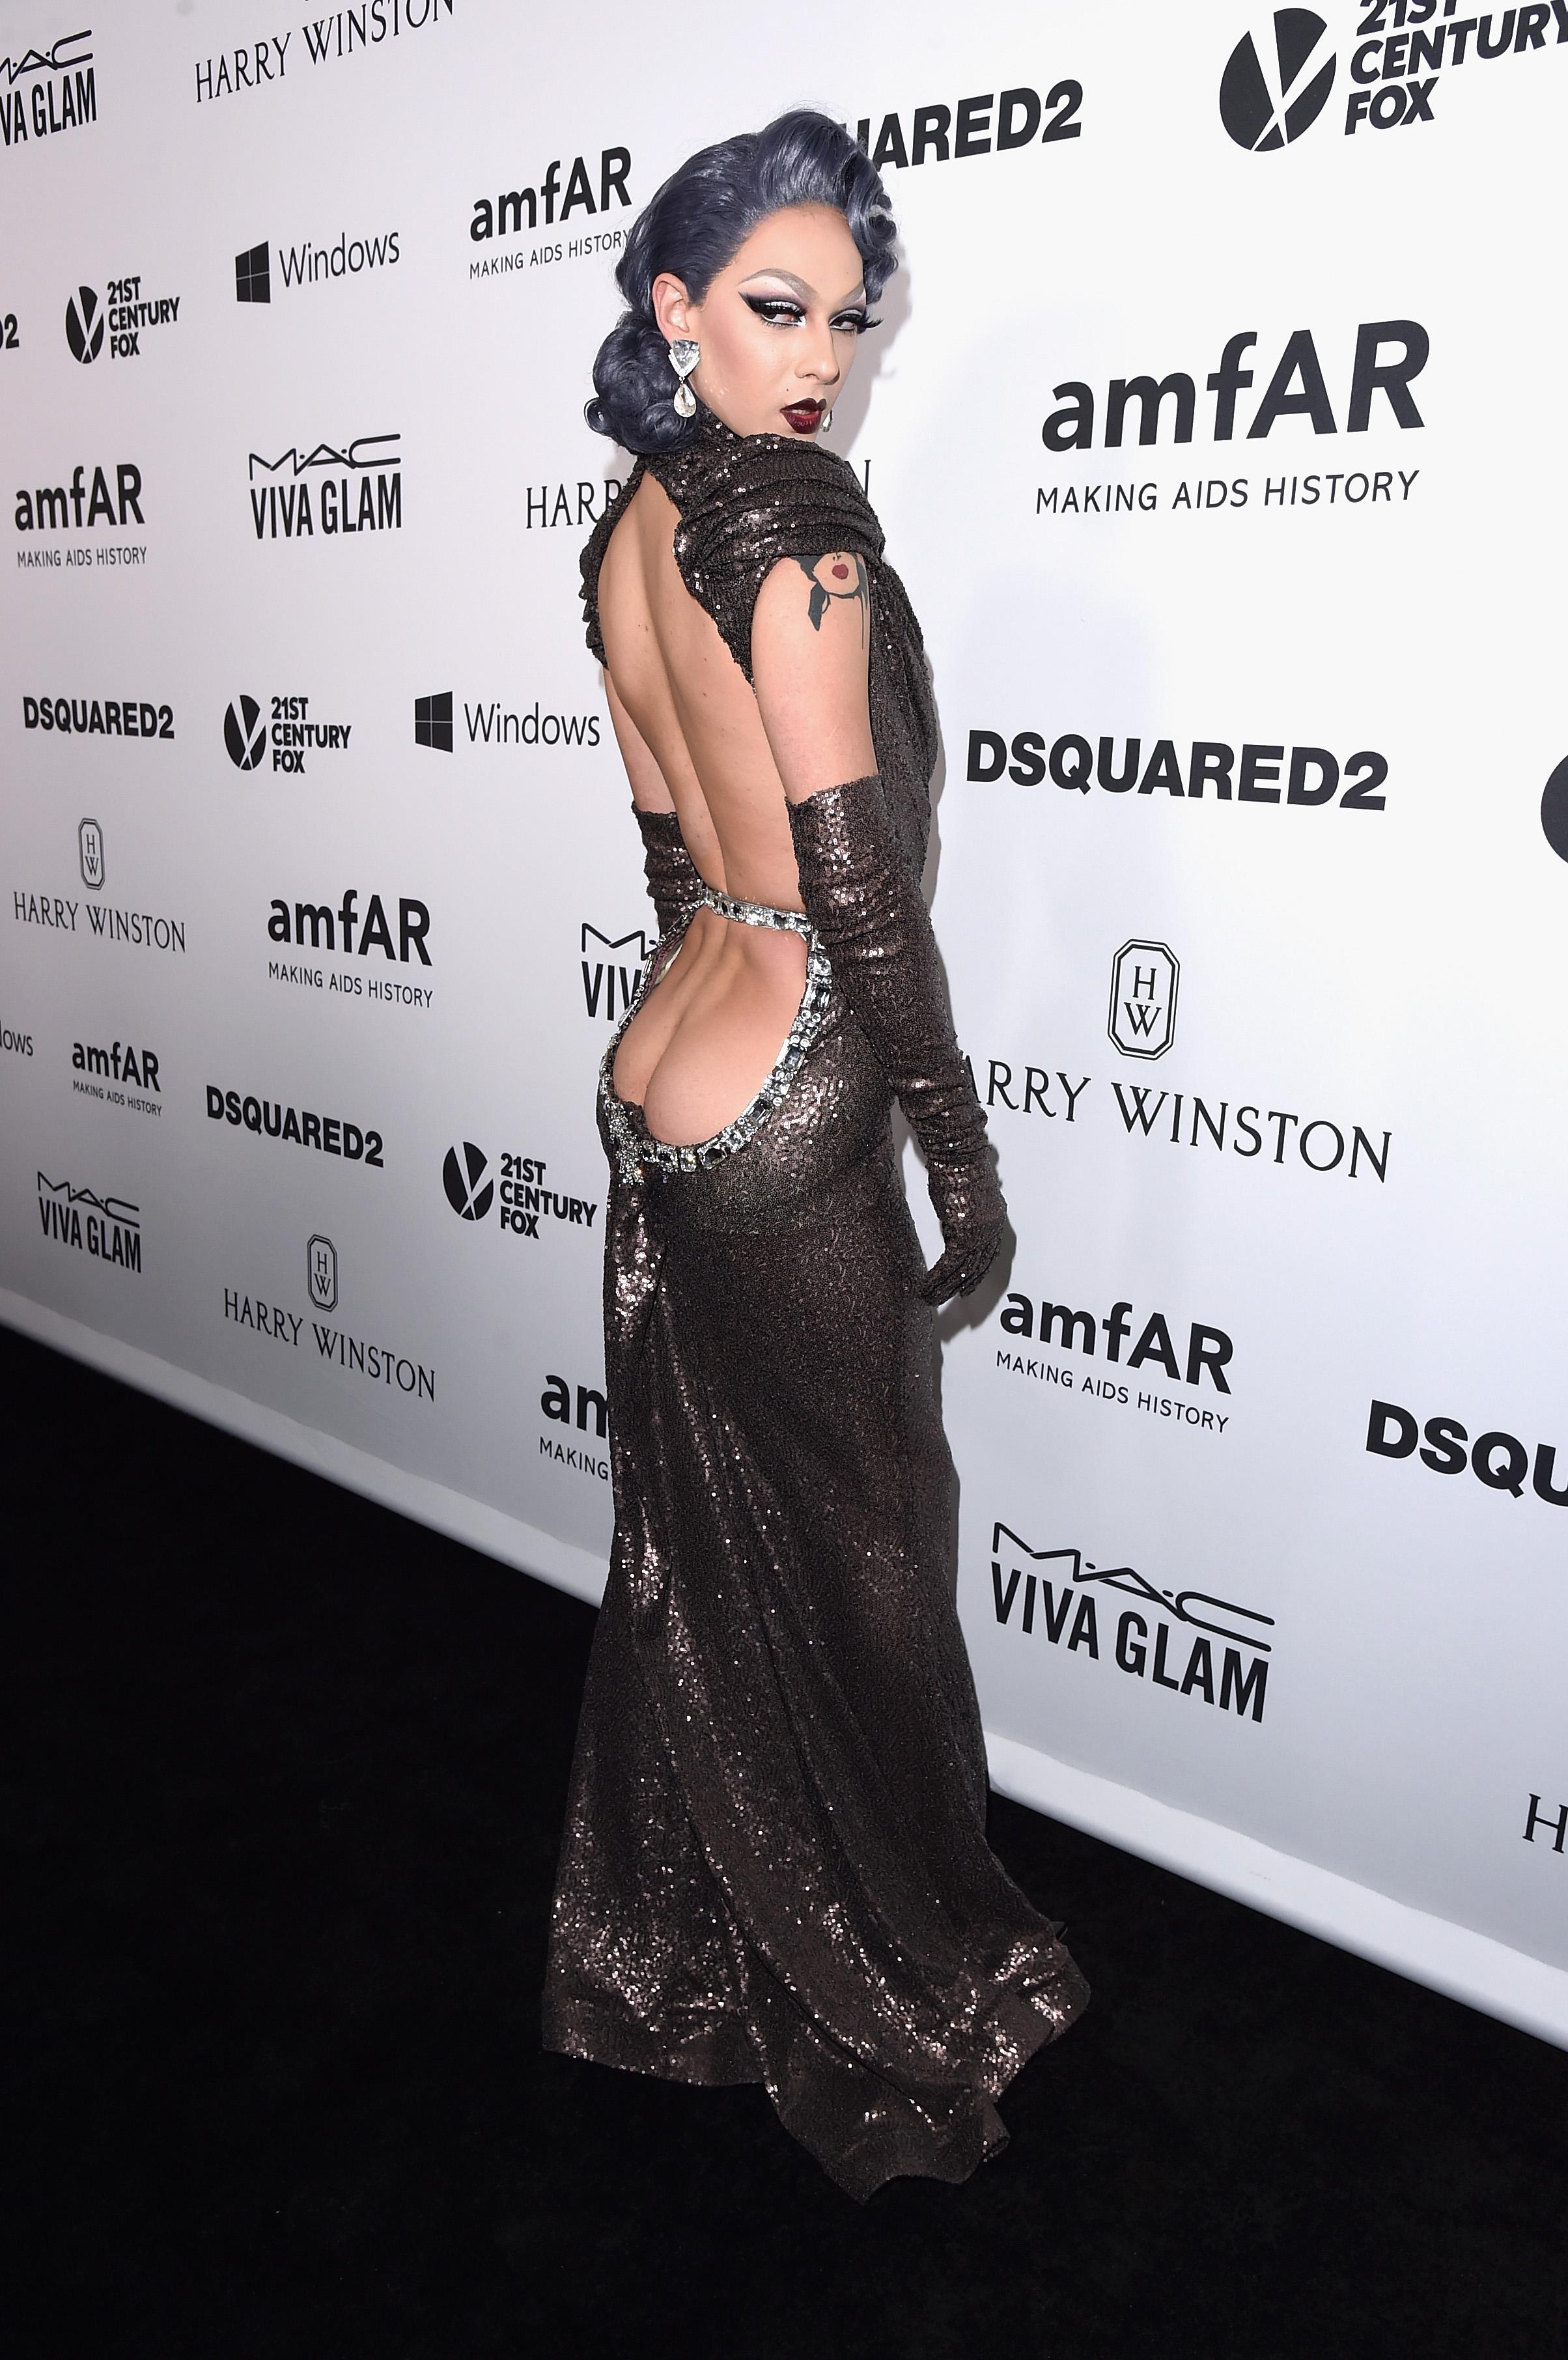 Michelle Rodriguez Bikini. 2018-2019 celebrityes photos leaks! new picture